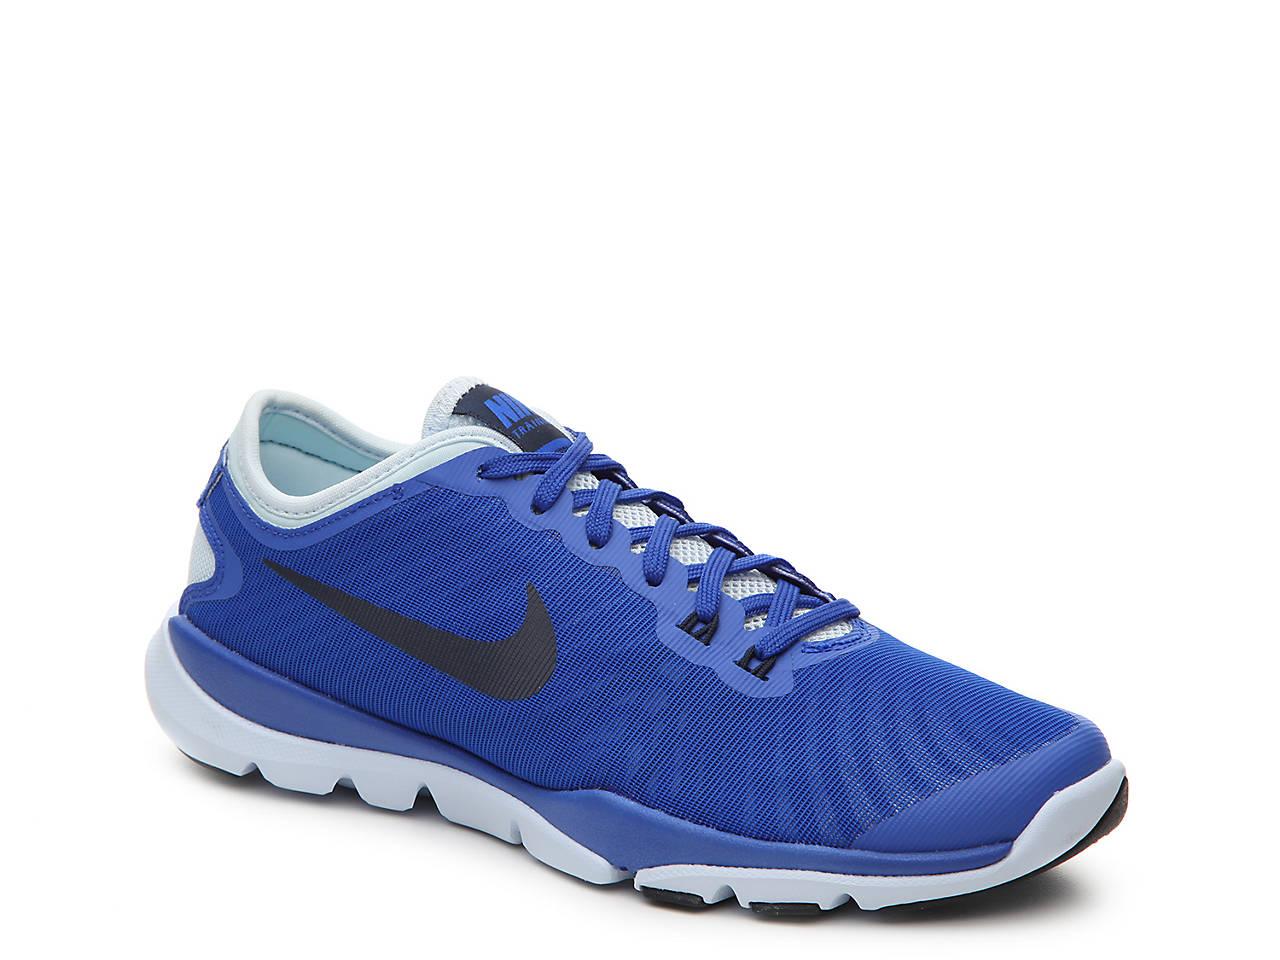 41396a48c125 Nike Flex Supreme TR 4 Training Shoe - Women s Women s Shoes